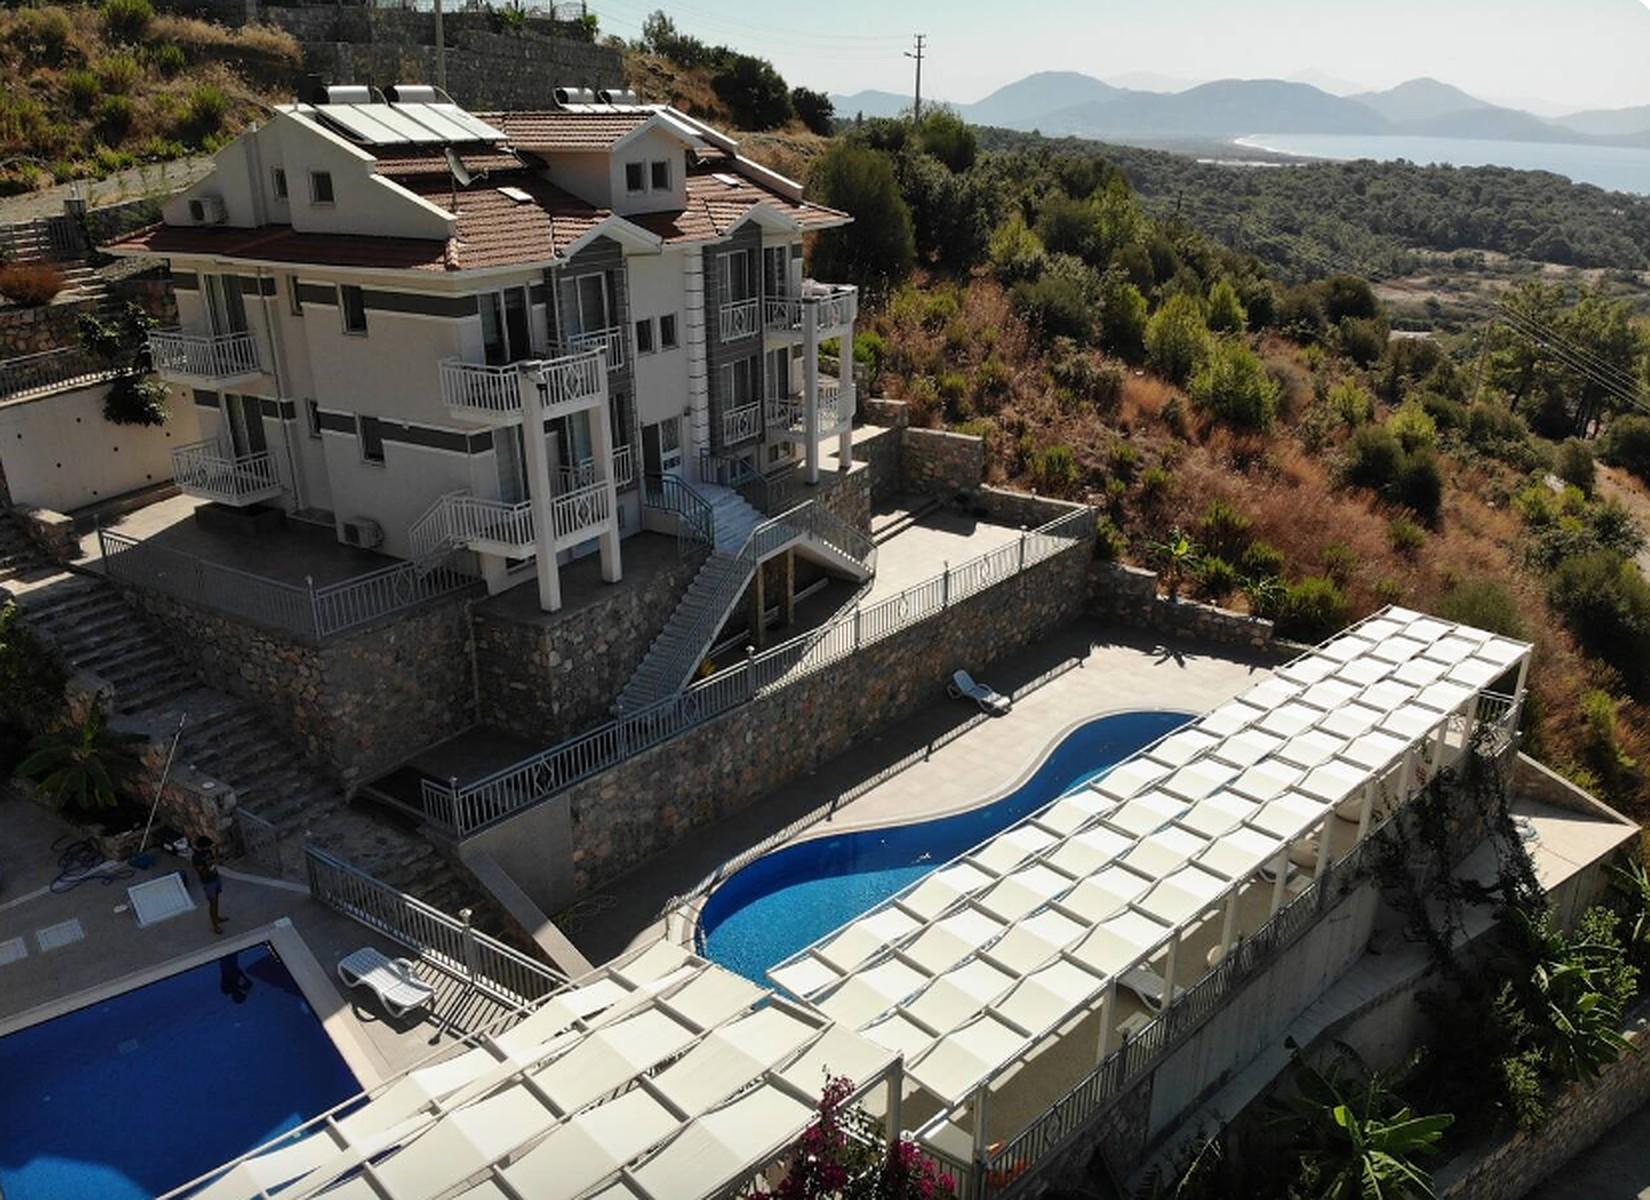 Ferienwohnung Begonville Apartment Klein (2654617), Sarıgerme, , Ägäisregion, Türkei, Bild 4